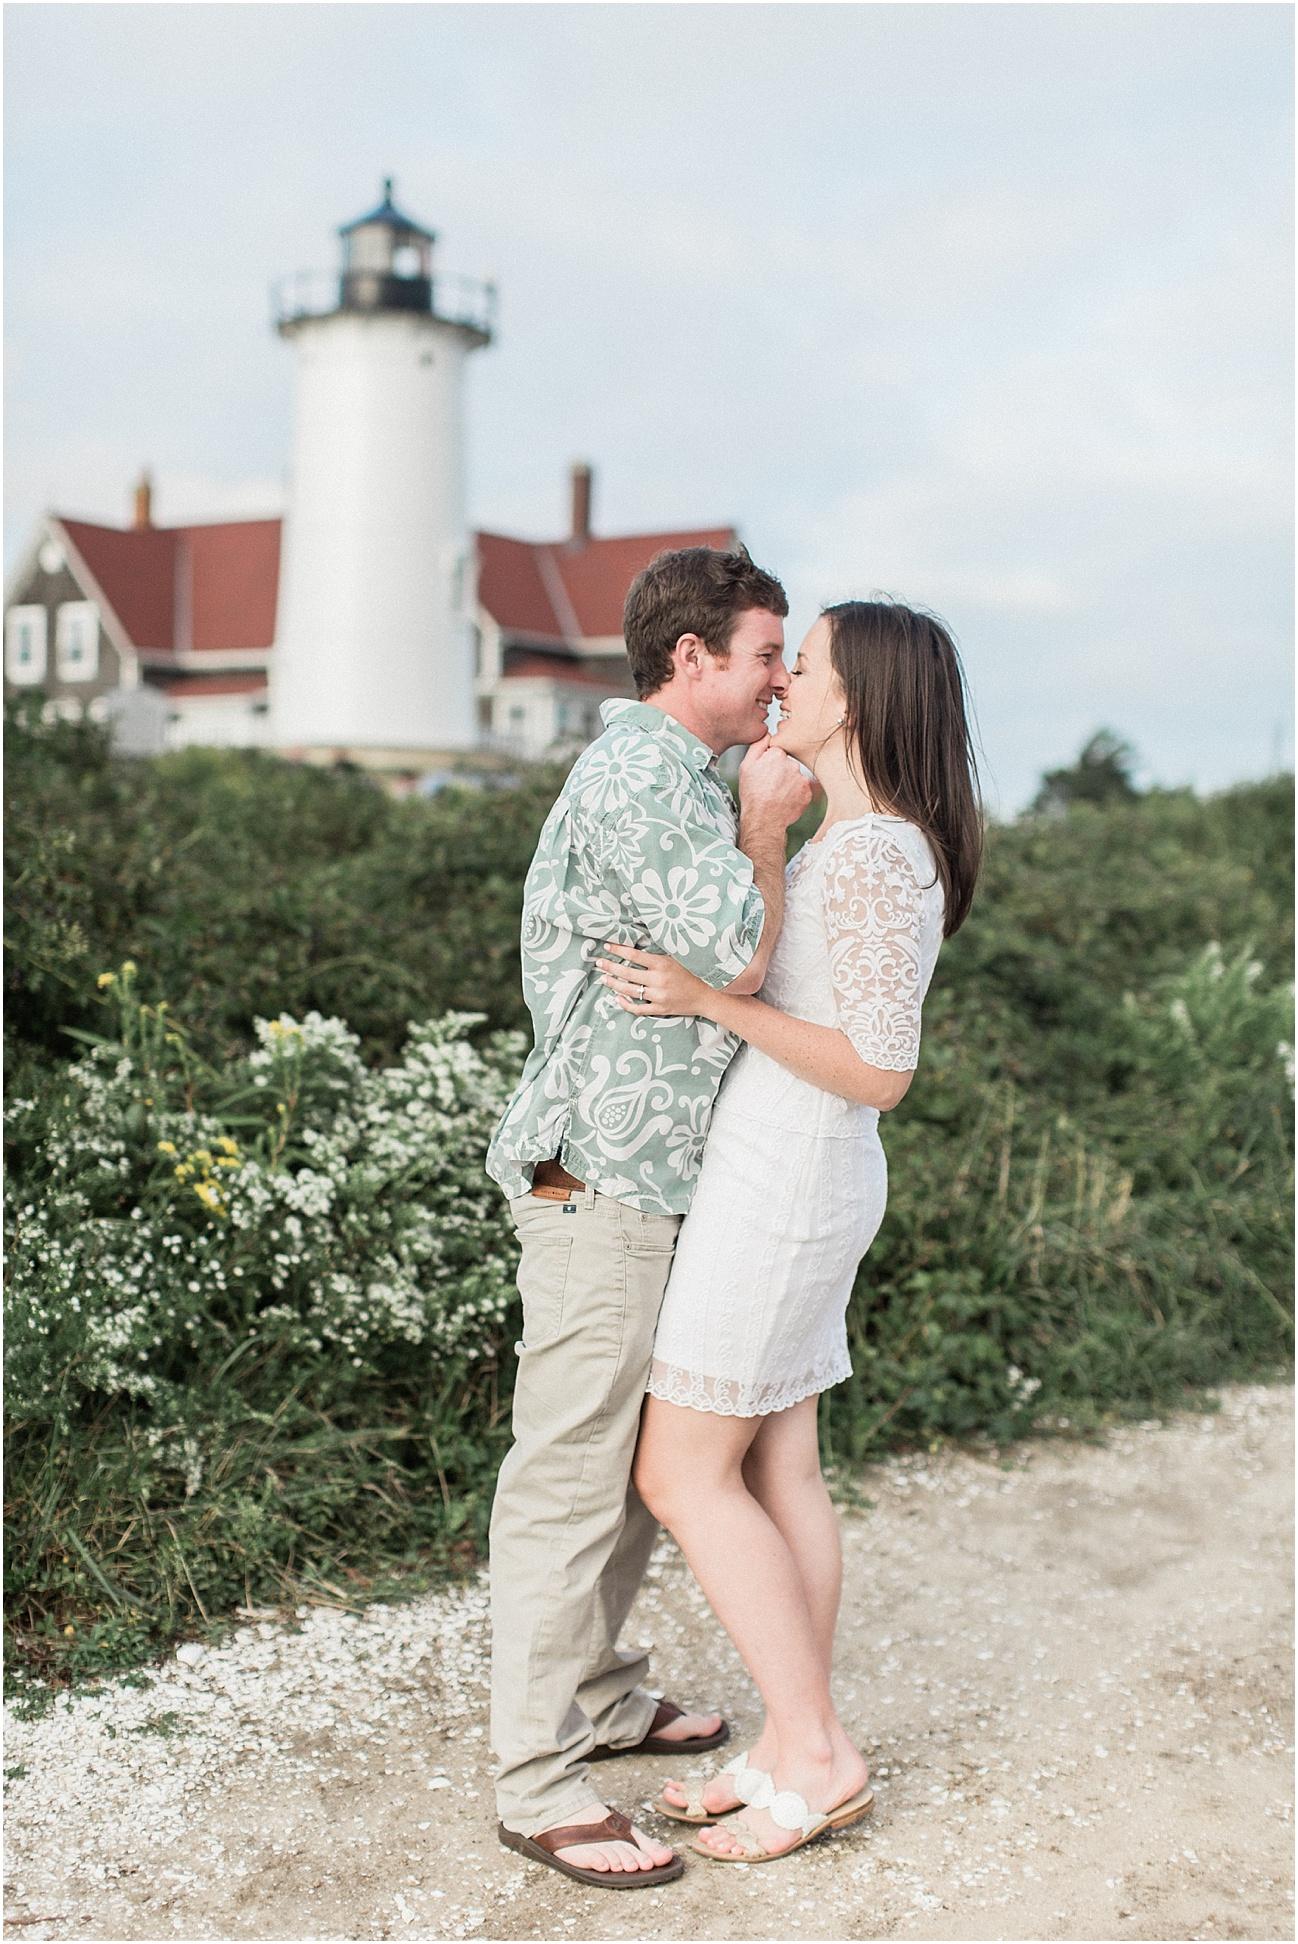 rosie_ryan_nobska_light_house_engagement_cape_cod_boston_wedding_photographer_meredith_jane_photography_photo_1069.jpg